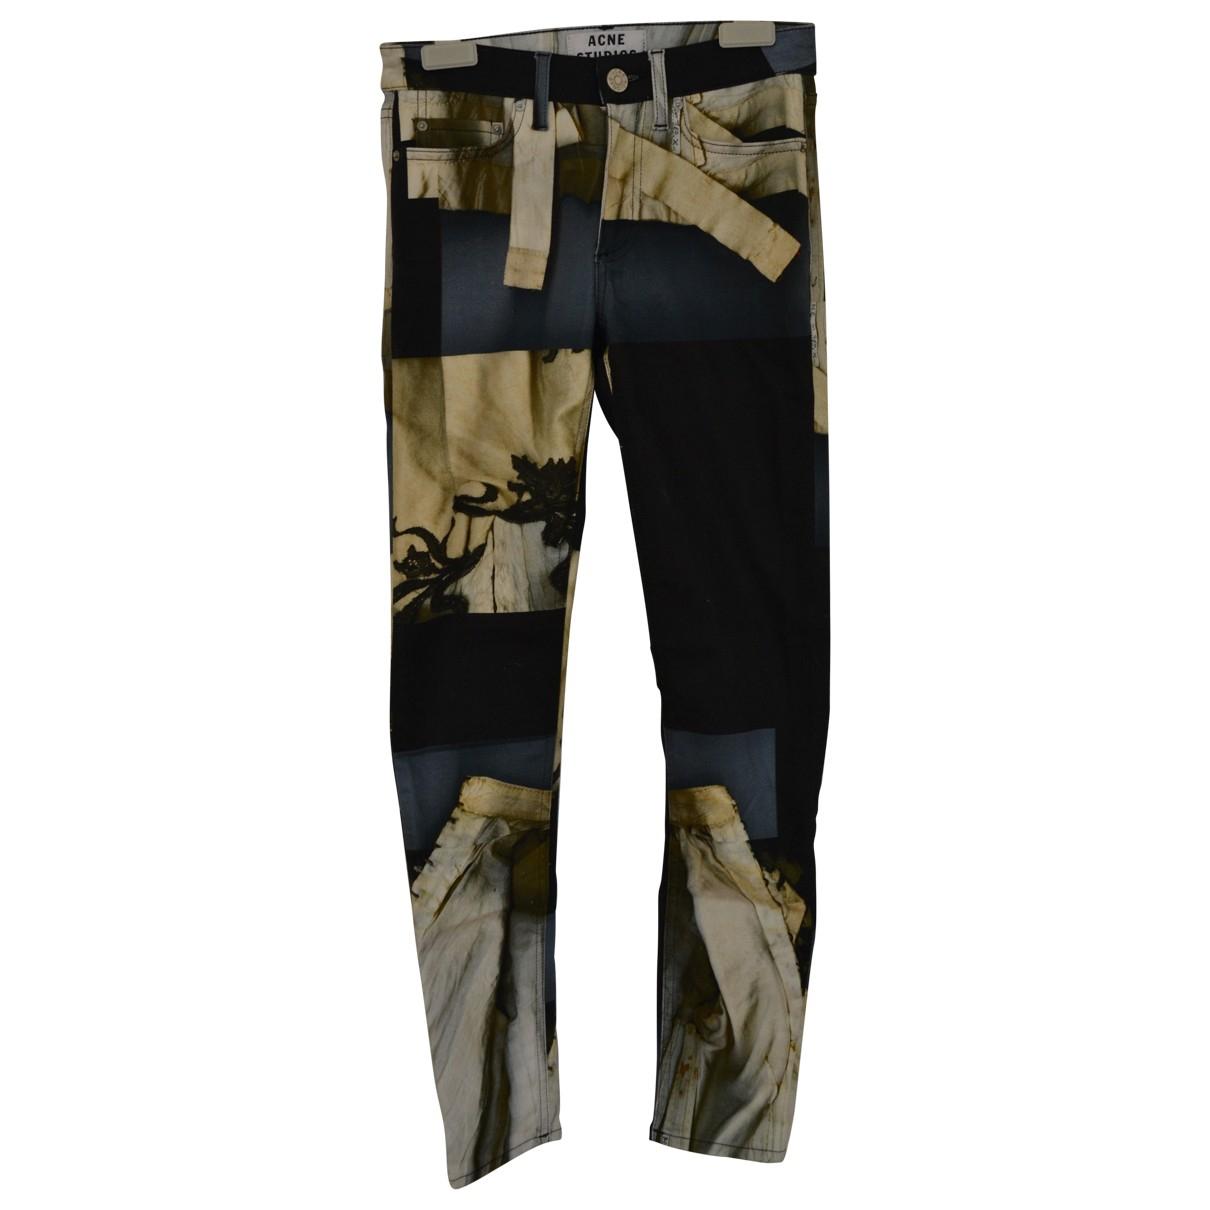 Acne Studios Slim pants